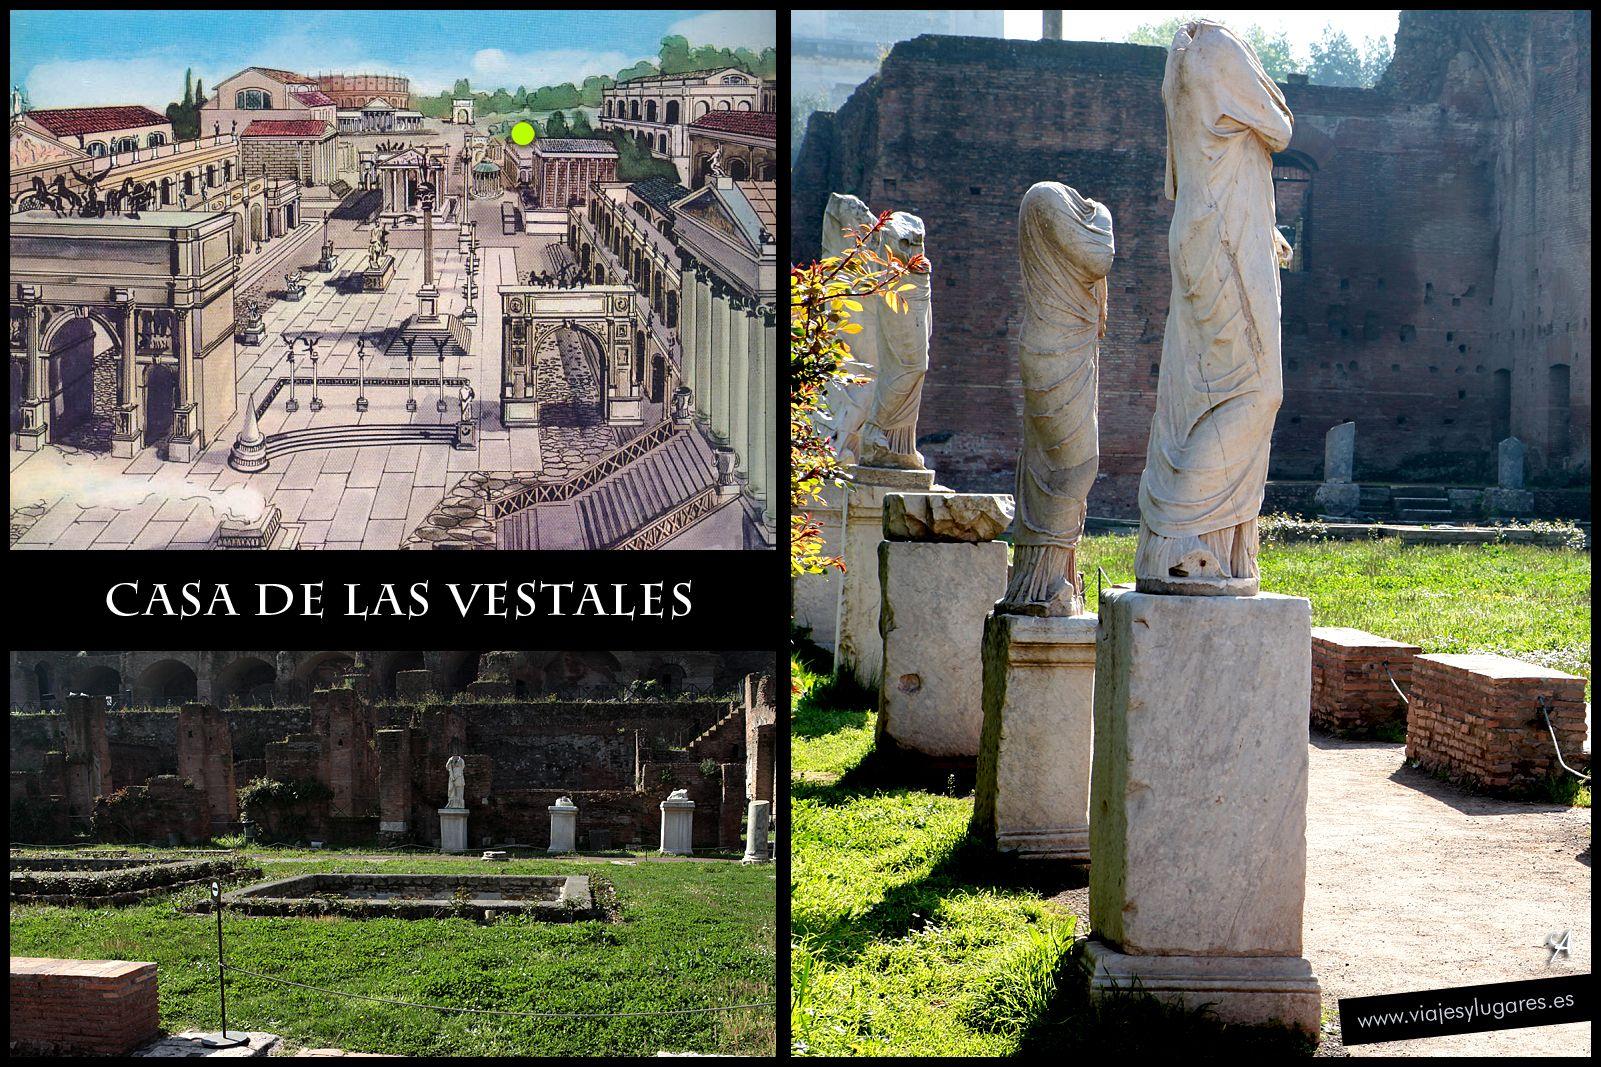 Casa de las Vestales • Foro Romano • Roma Roma, Roma